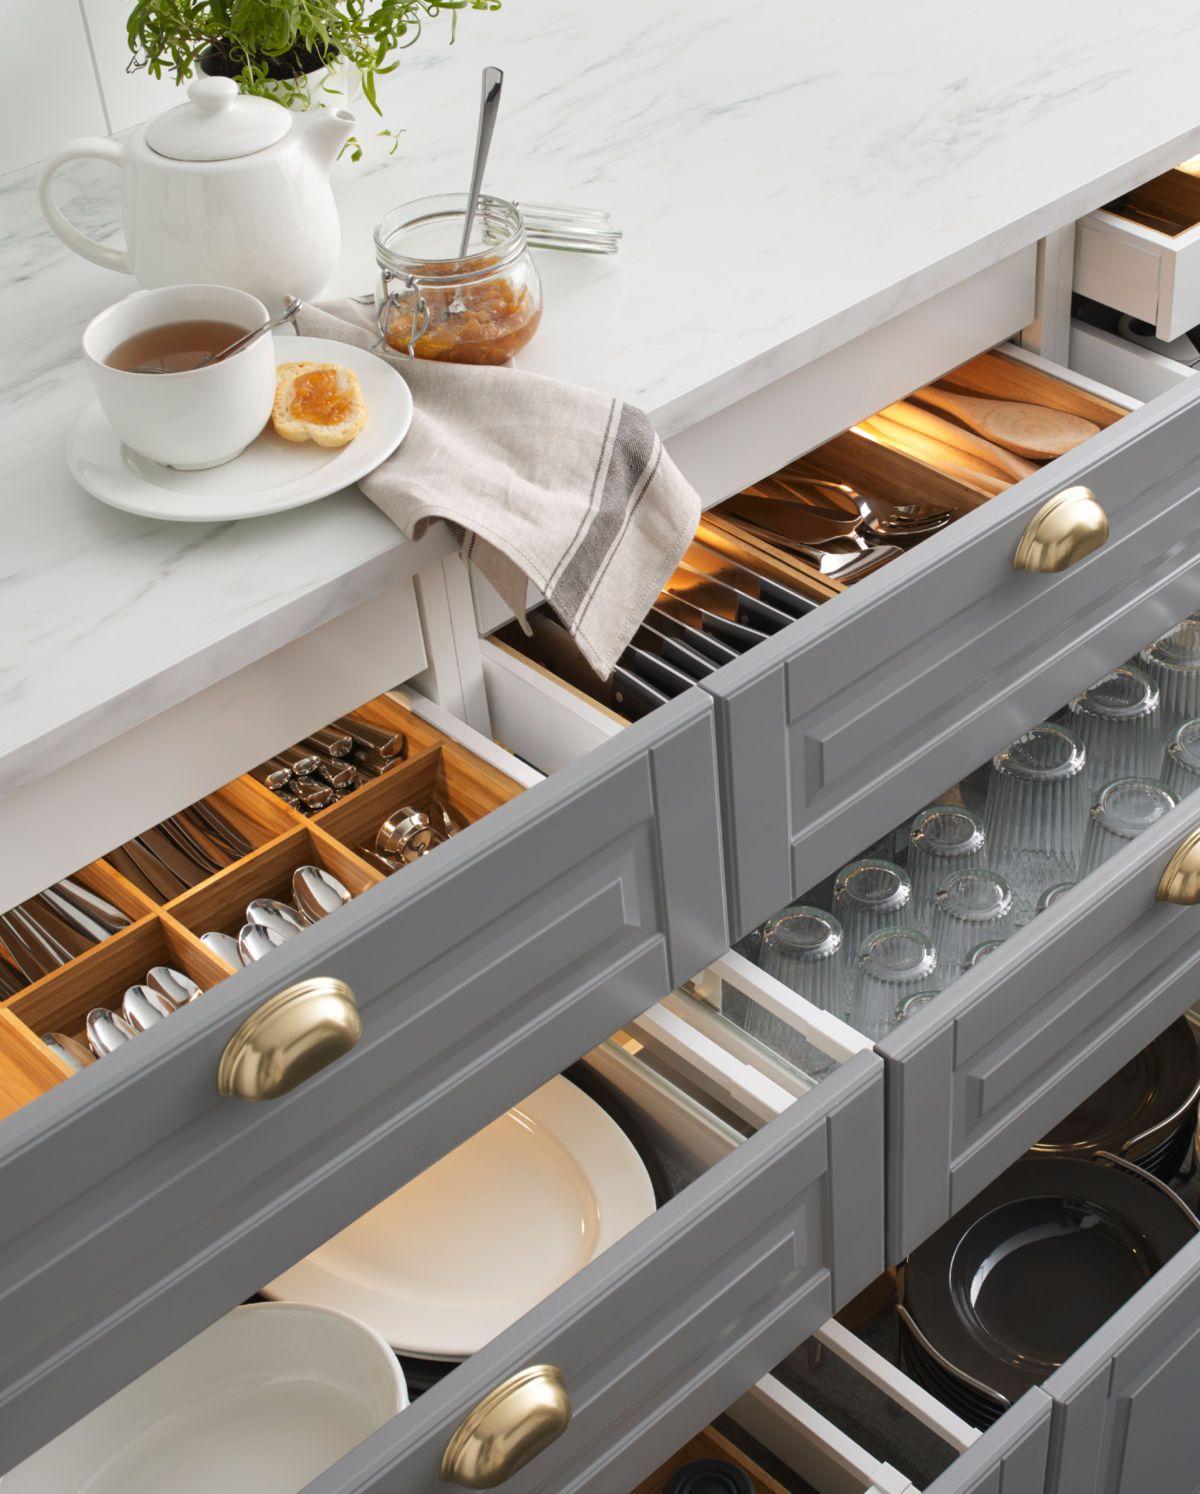 Brochure cuisines ikea 2017 idee1 for Ikea home planner 2017